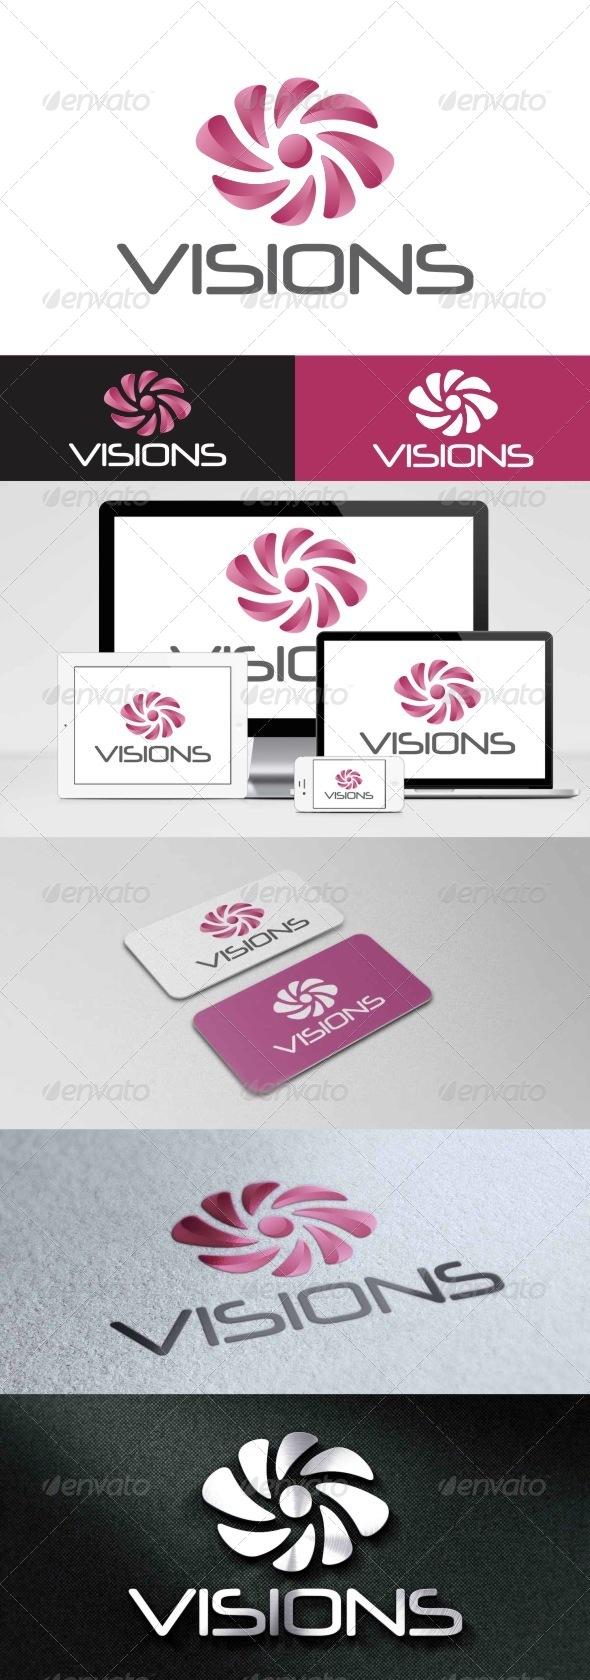 GraphicRiver Visions Logo 8156519